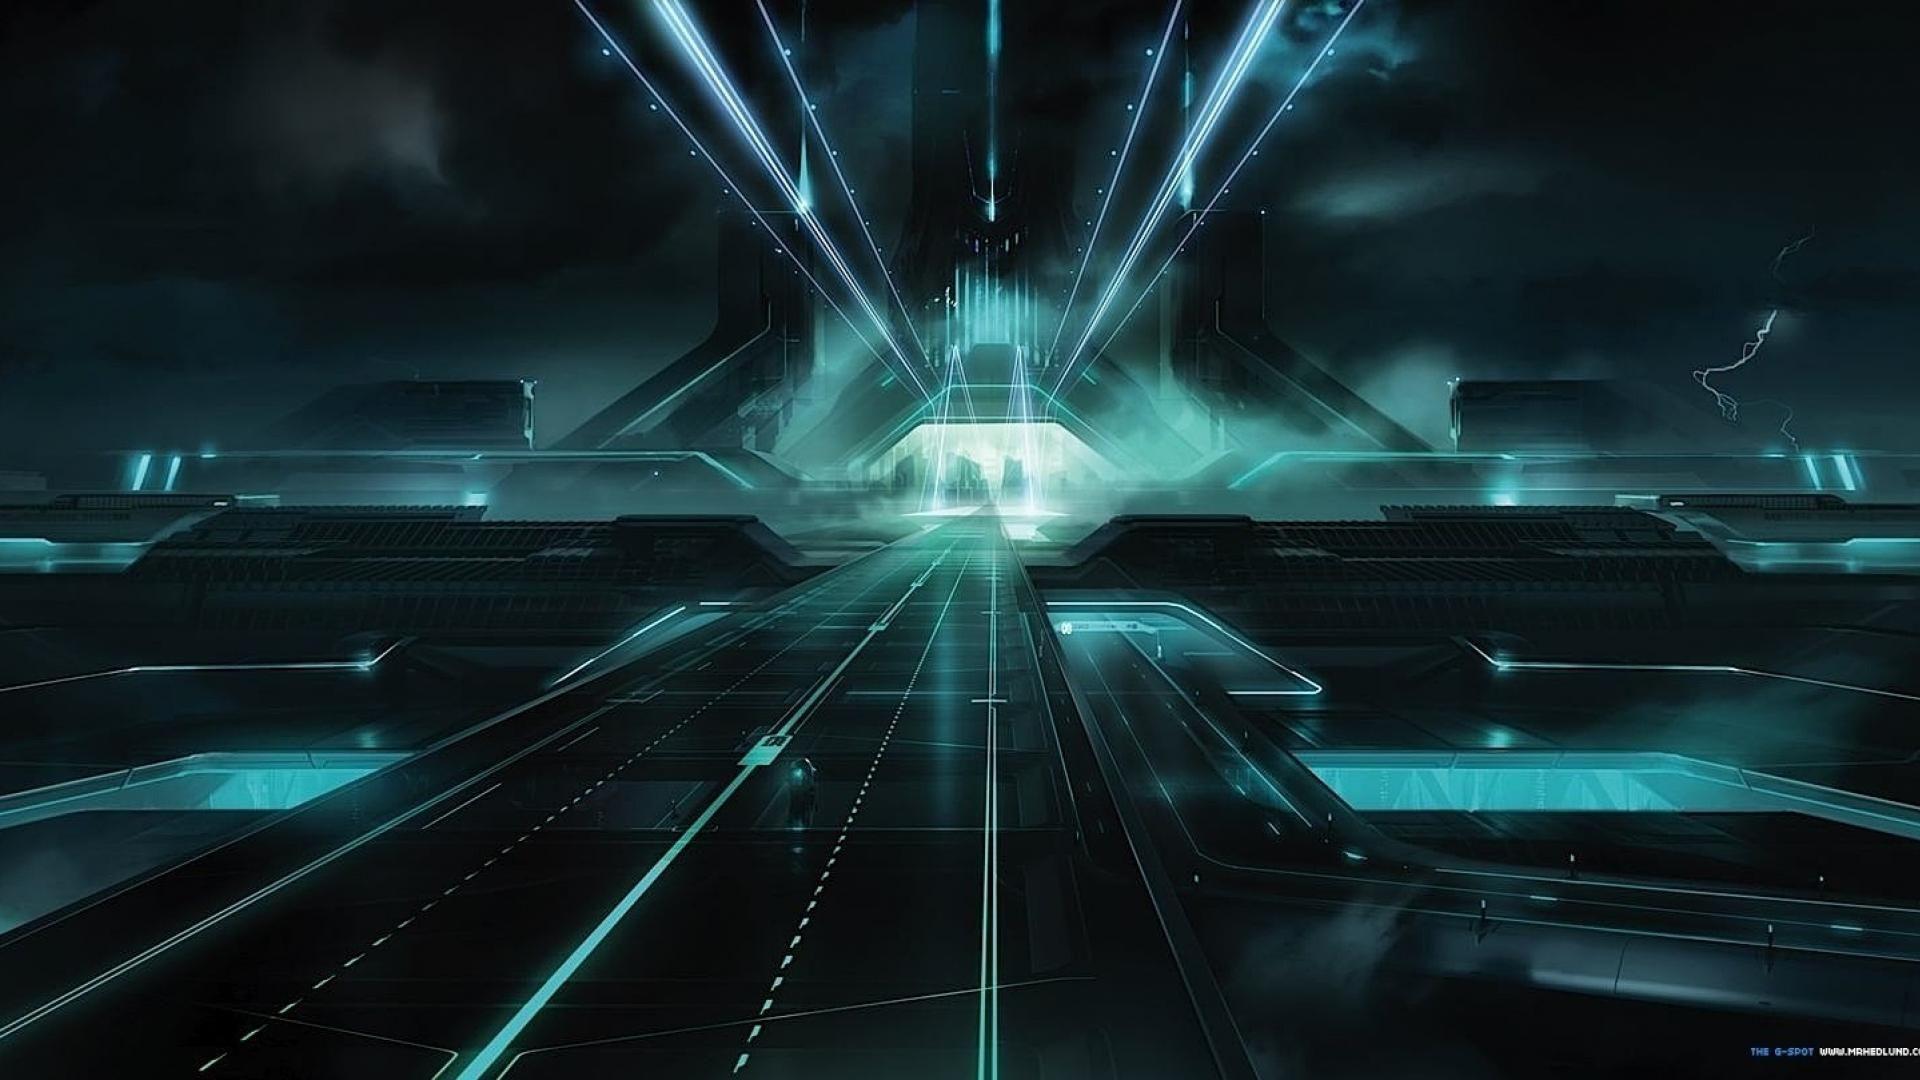 Tron Legacy Concept Art Artwork 1920x1080 17160 Jpg 1920 1080 Tron Legacy Sci Fi Background Tron